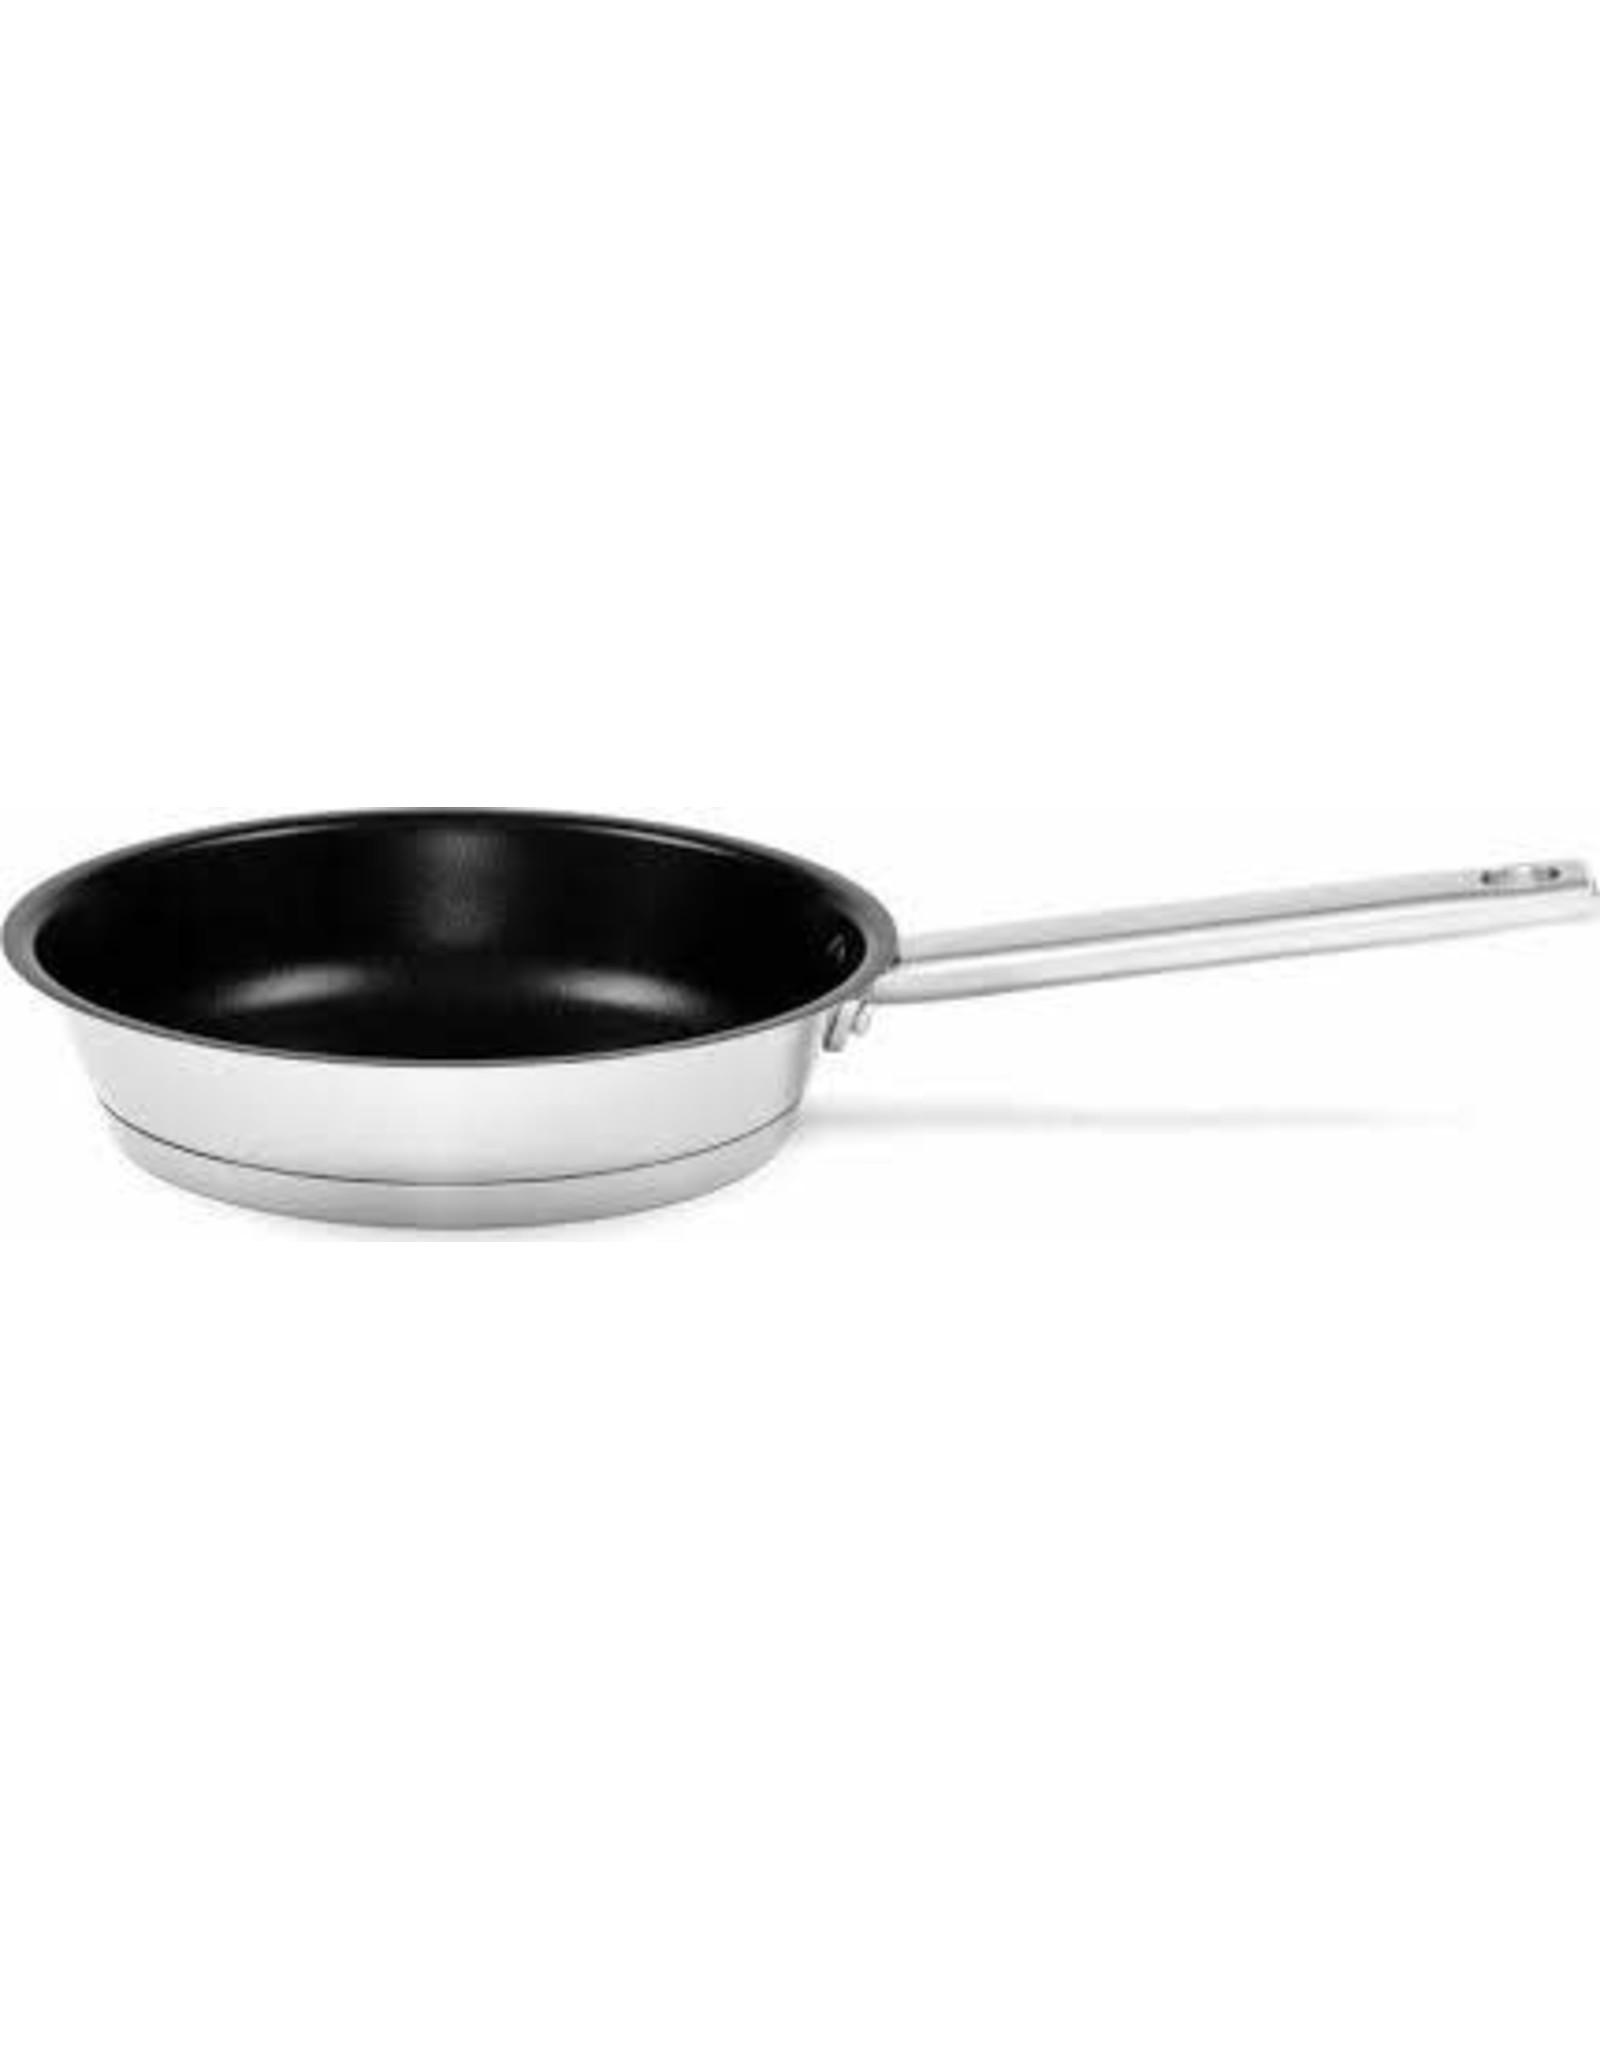 BK koekenpan Bk 20 cm essentials  stainless steel PFOA VRIJ